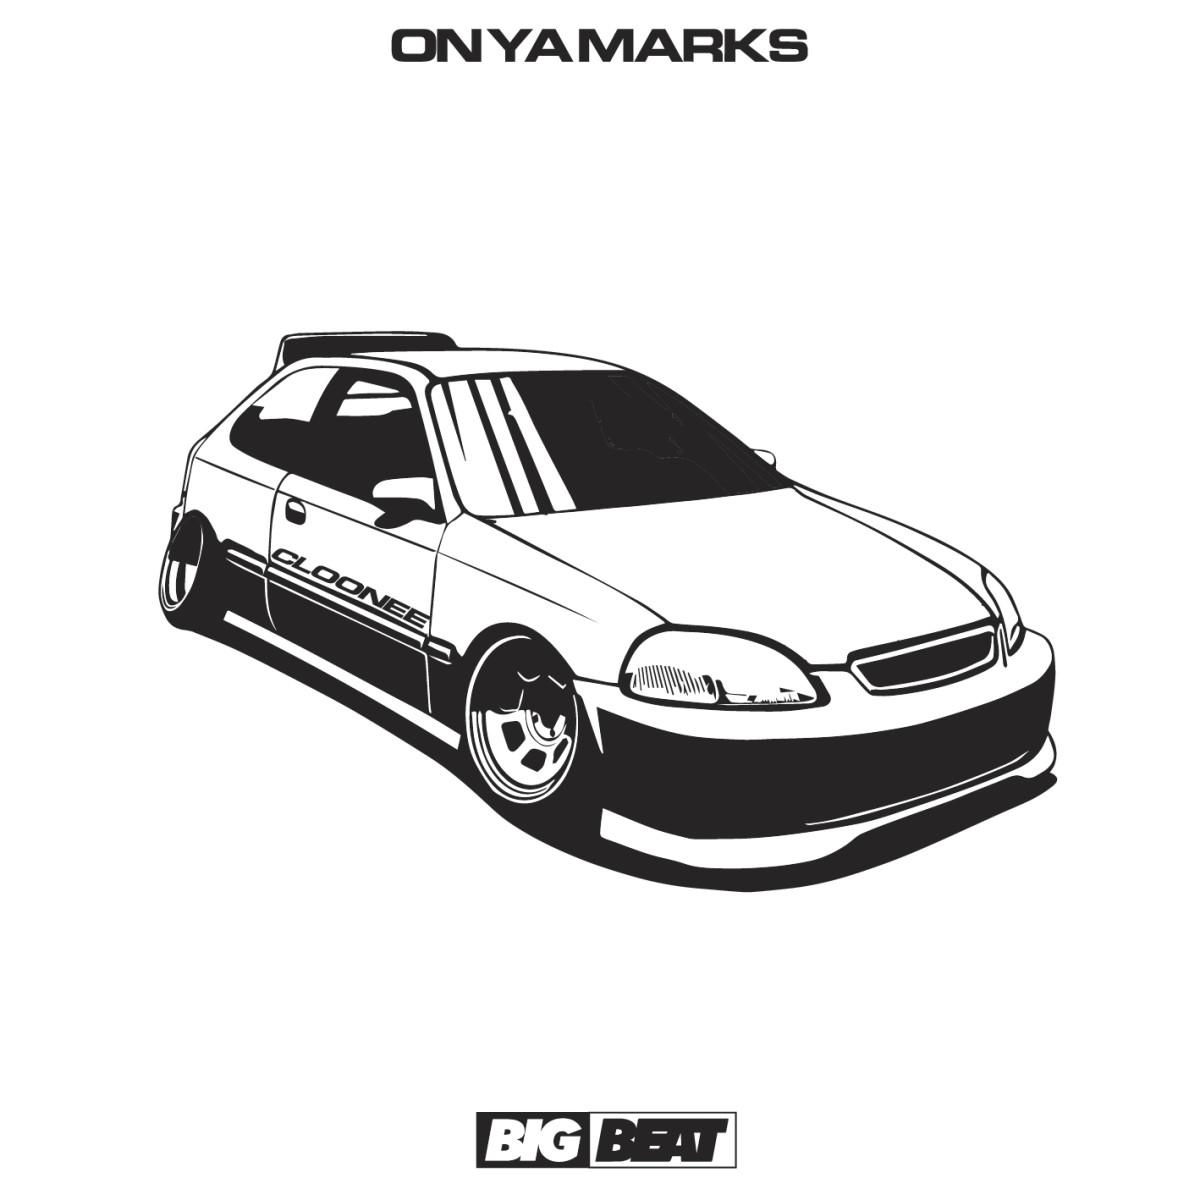 Cloonee-On-Ya-Marks